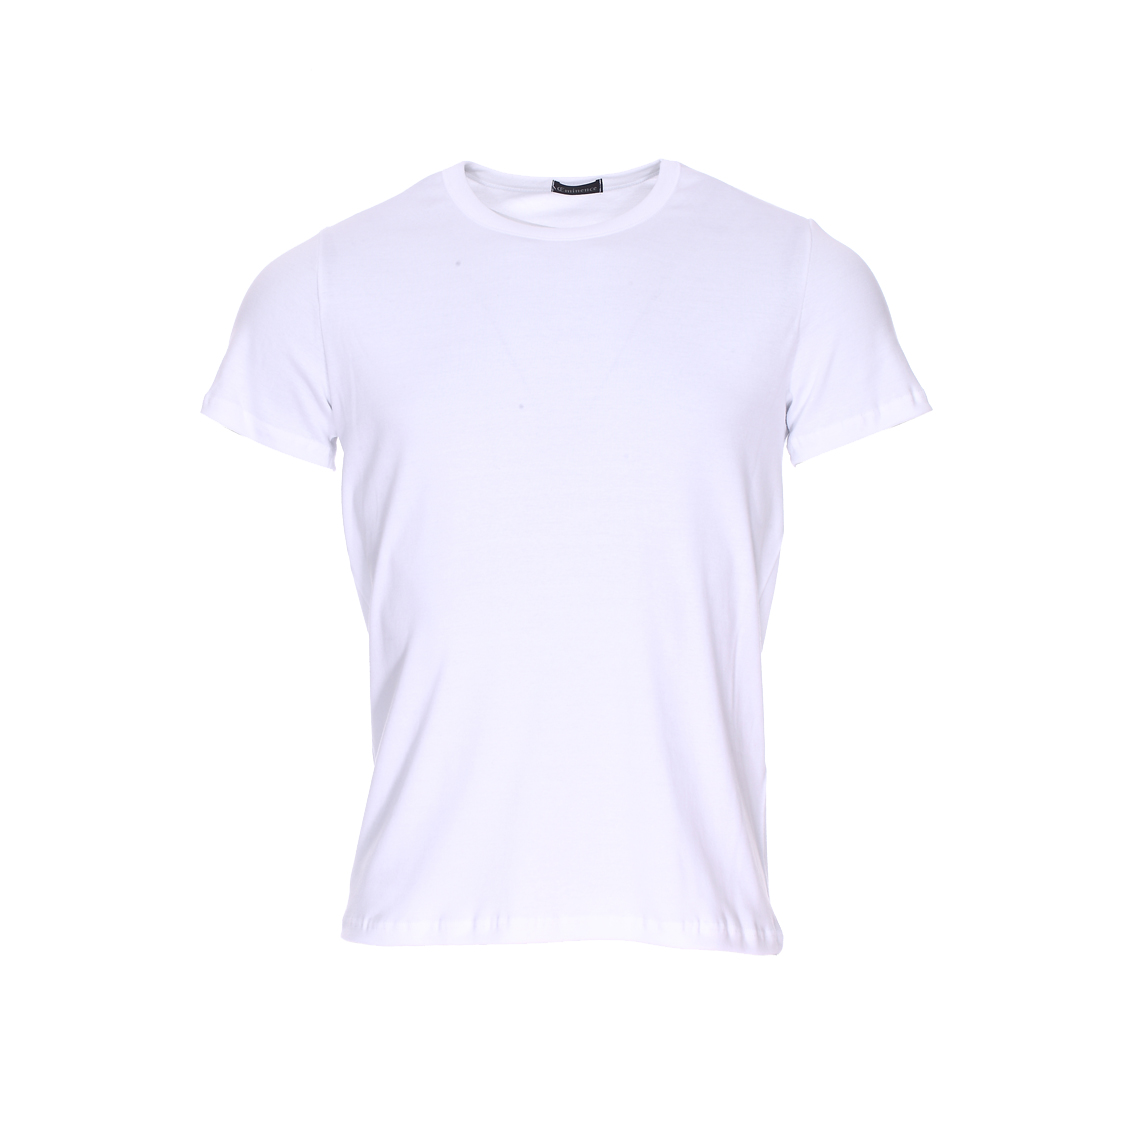 Tee-shirt col rond Eminence L'Optimum en coton blanc, tissu français